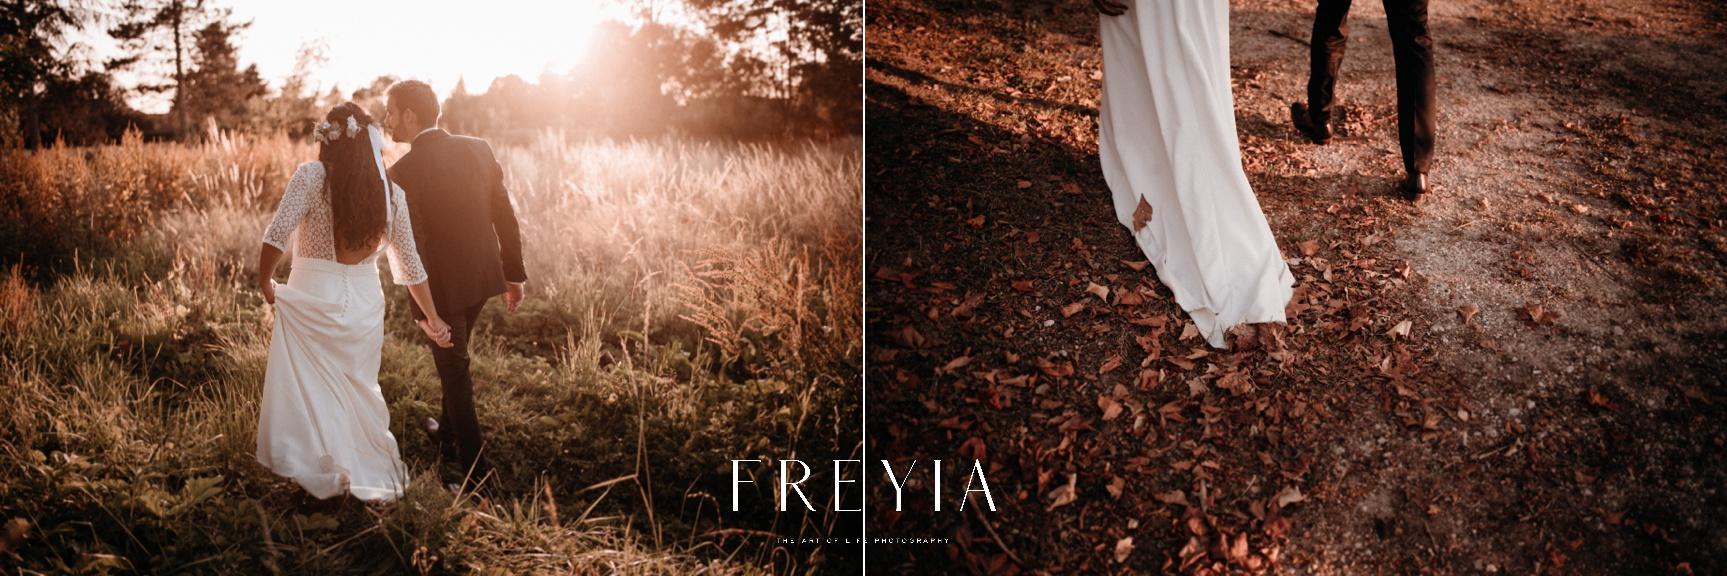 R + T |  mariage reportage alternatif moody intime minimaliste vintage naturel boho boheme |  PHOTOGRAPHE mariage PARIS france destination  | FREYIA photography_-318.jpg